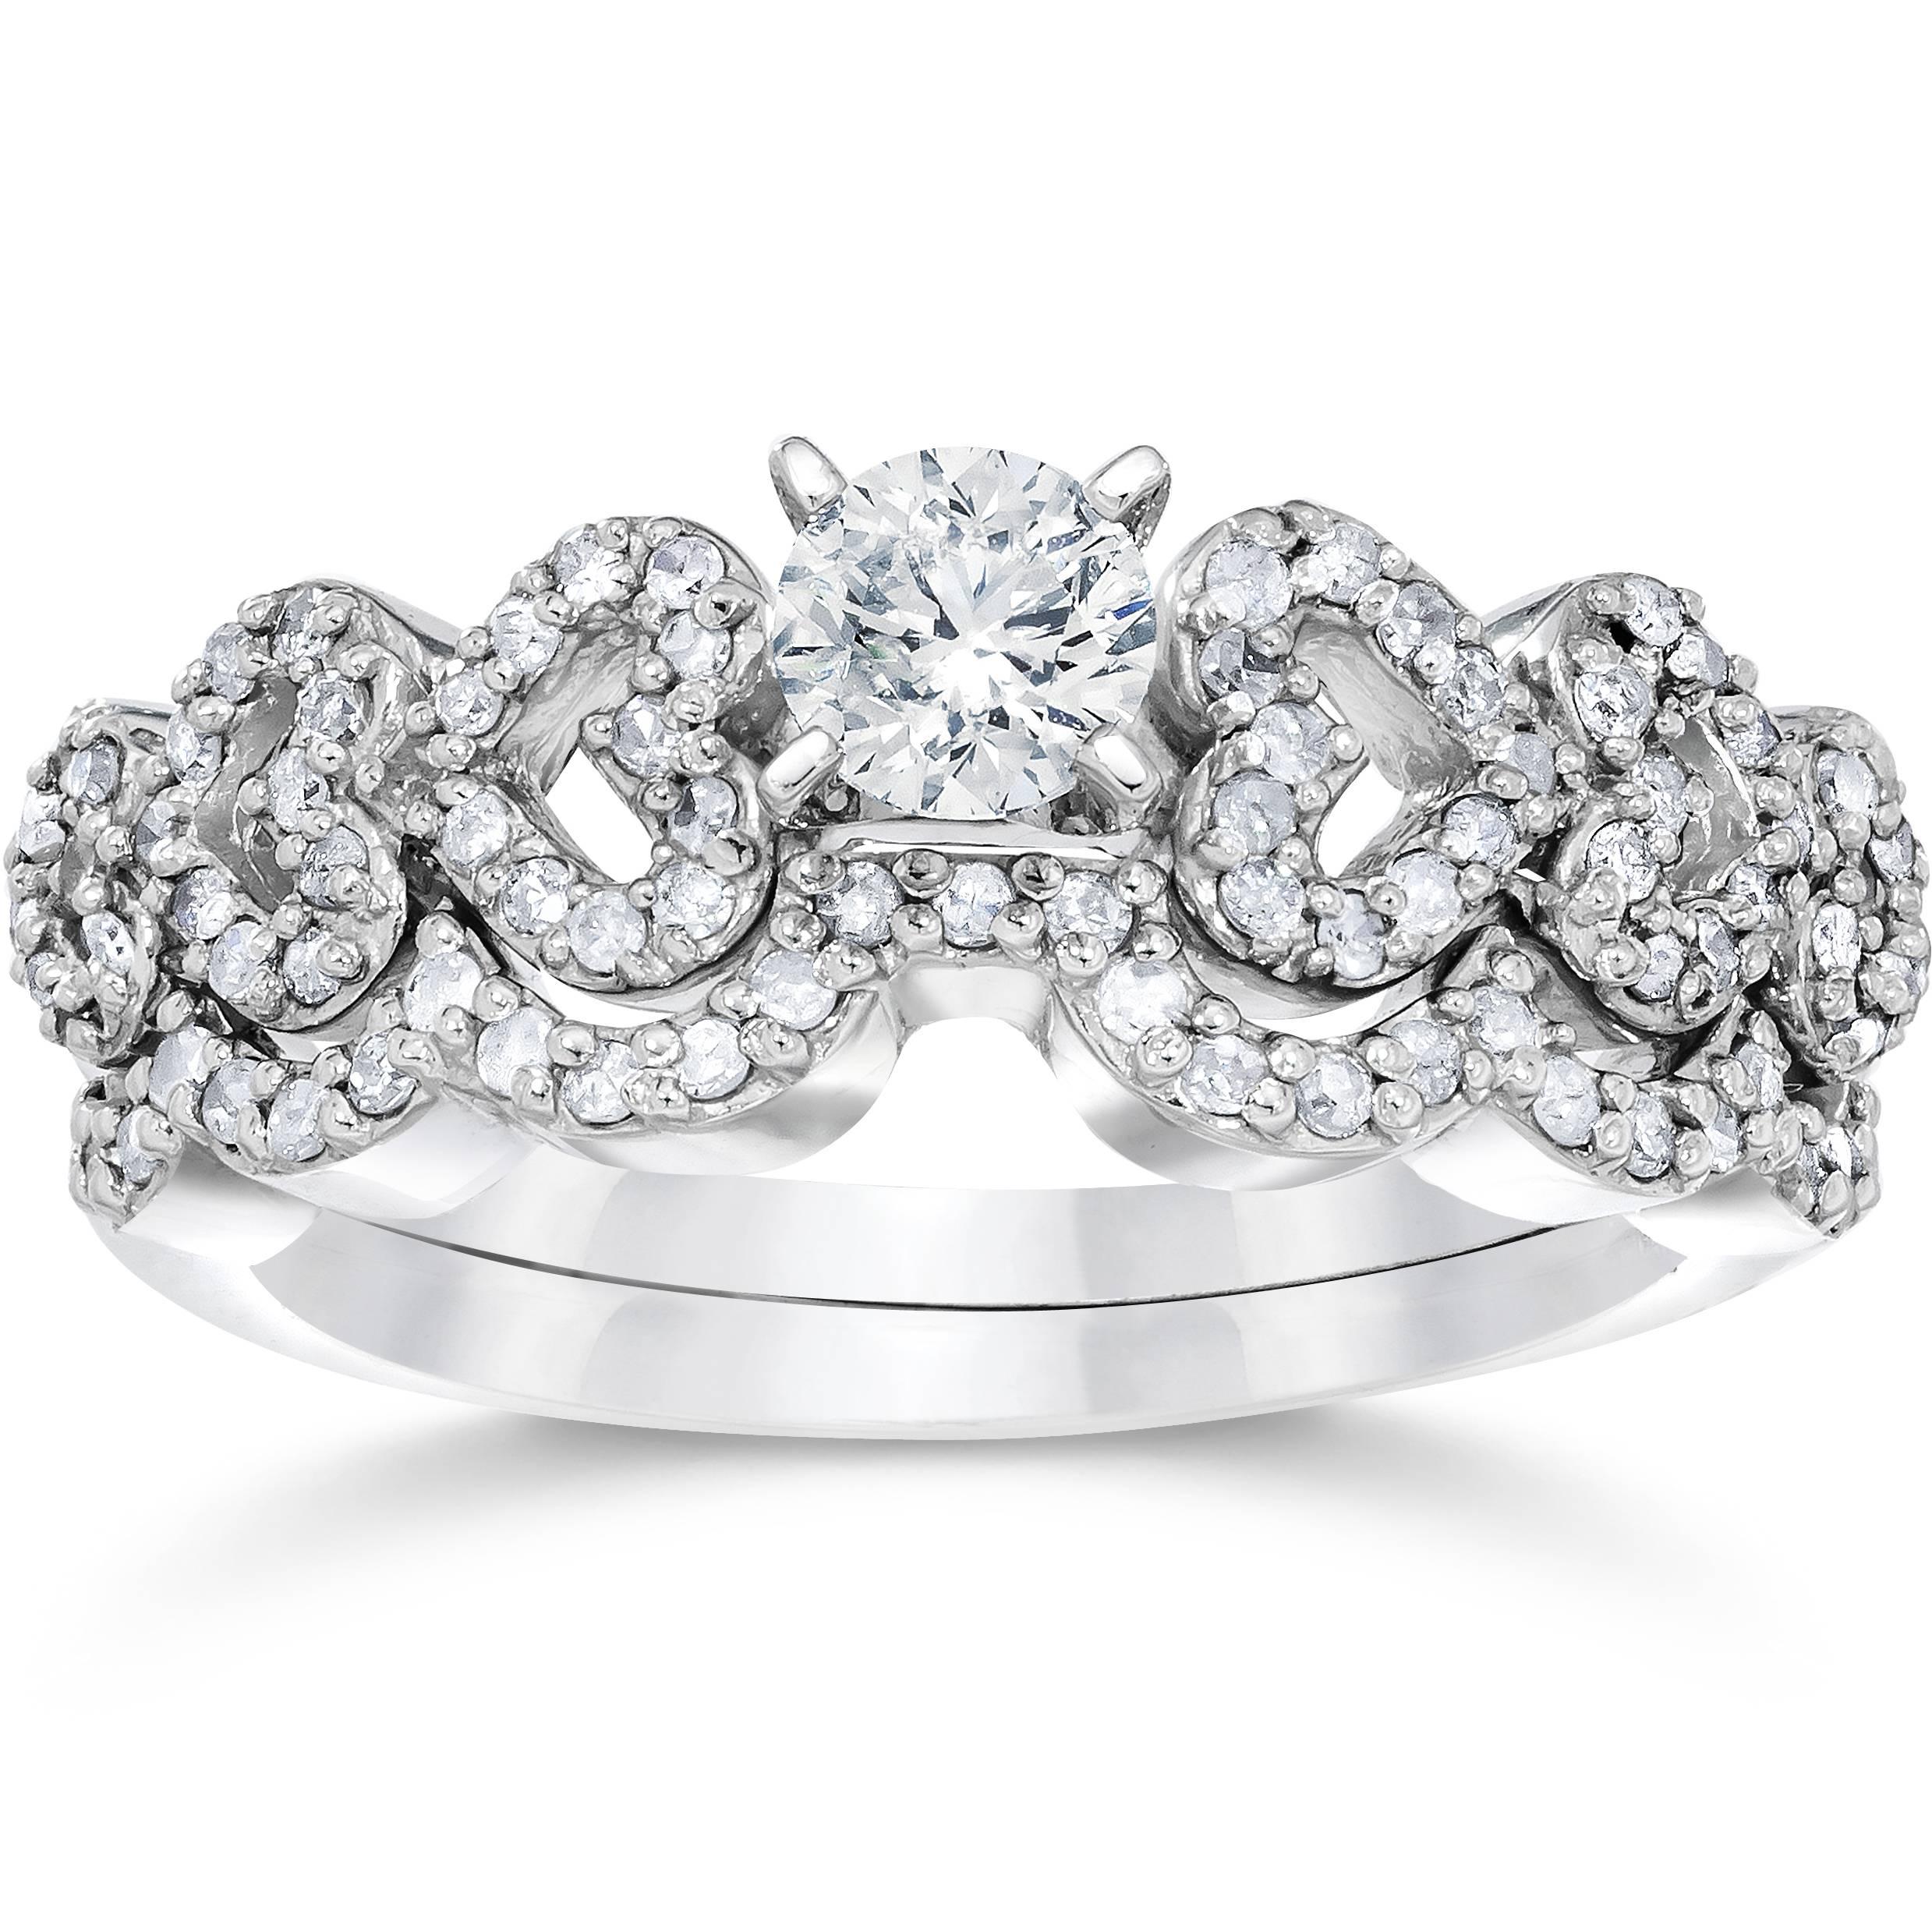 3 4ct heart shape diamond engagement ring set 14k white. Black Bedroom Furniture Sets. Home Design Ideas